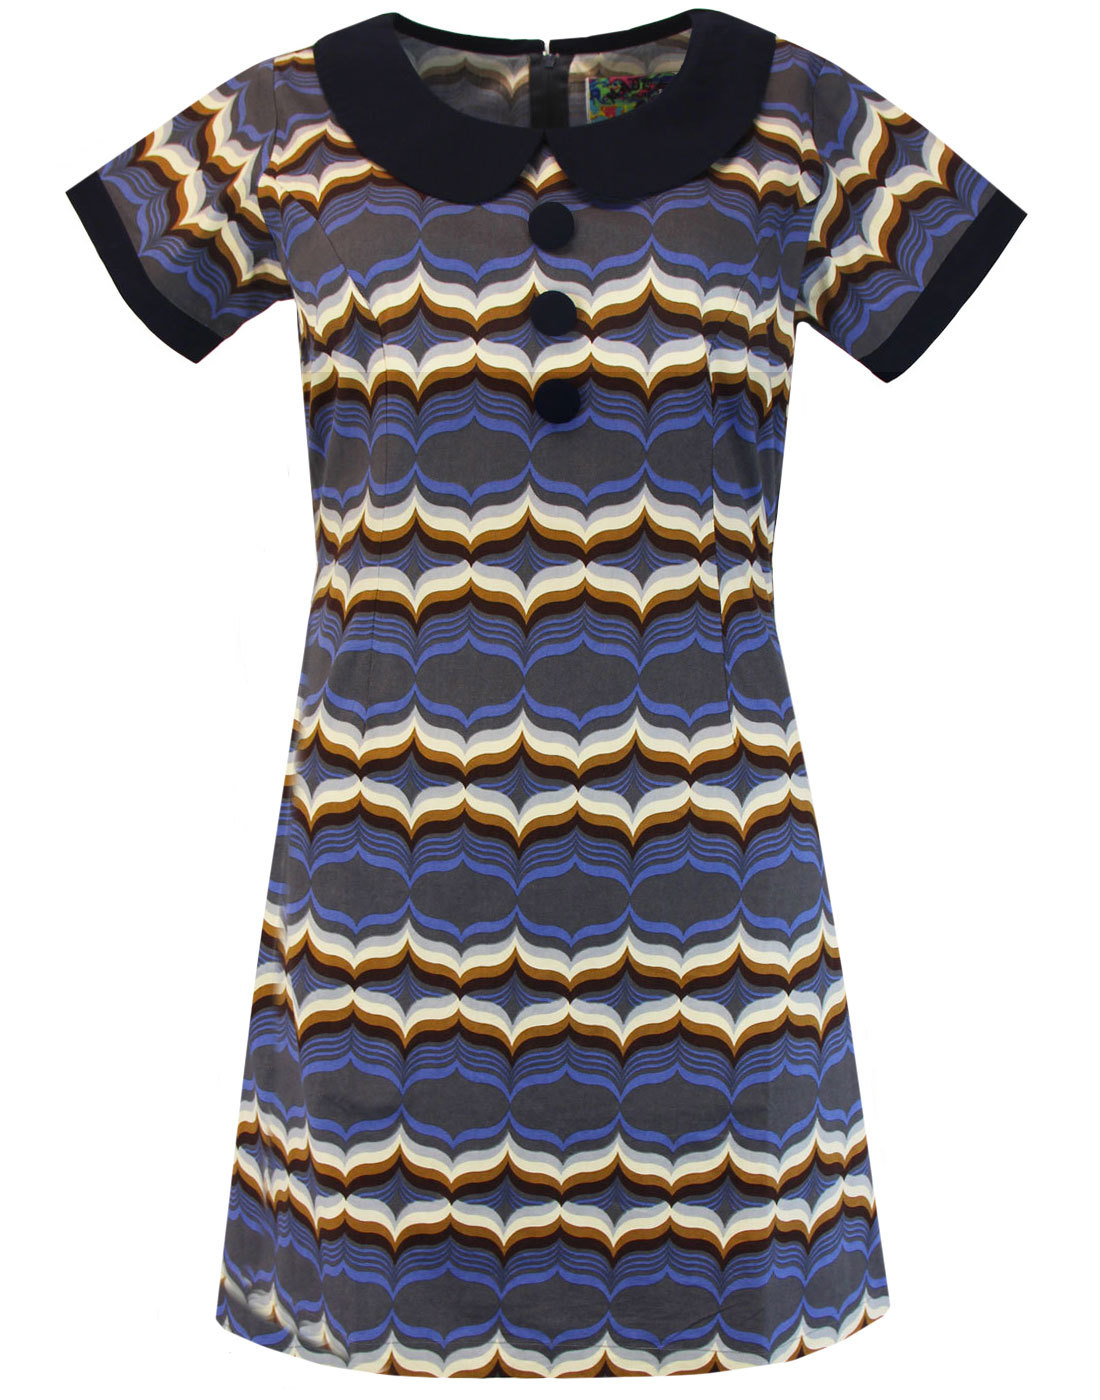 Dollierocker Waves MADCAP ENGLAND 60s Mod Dress